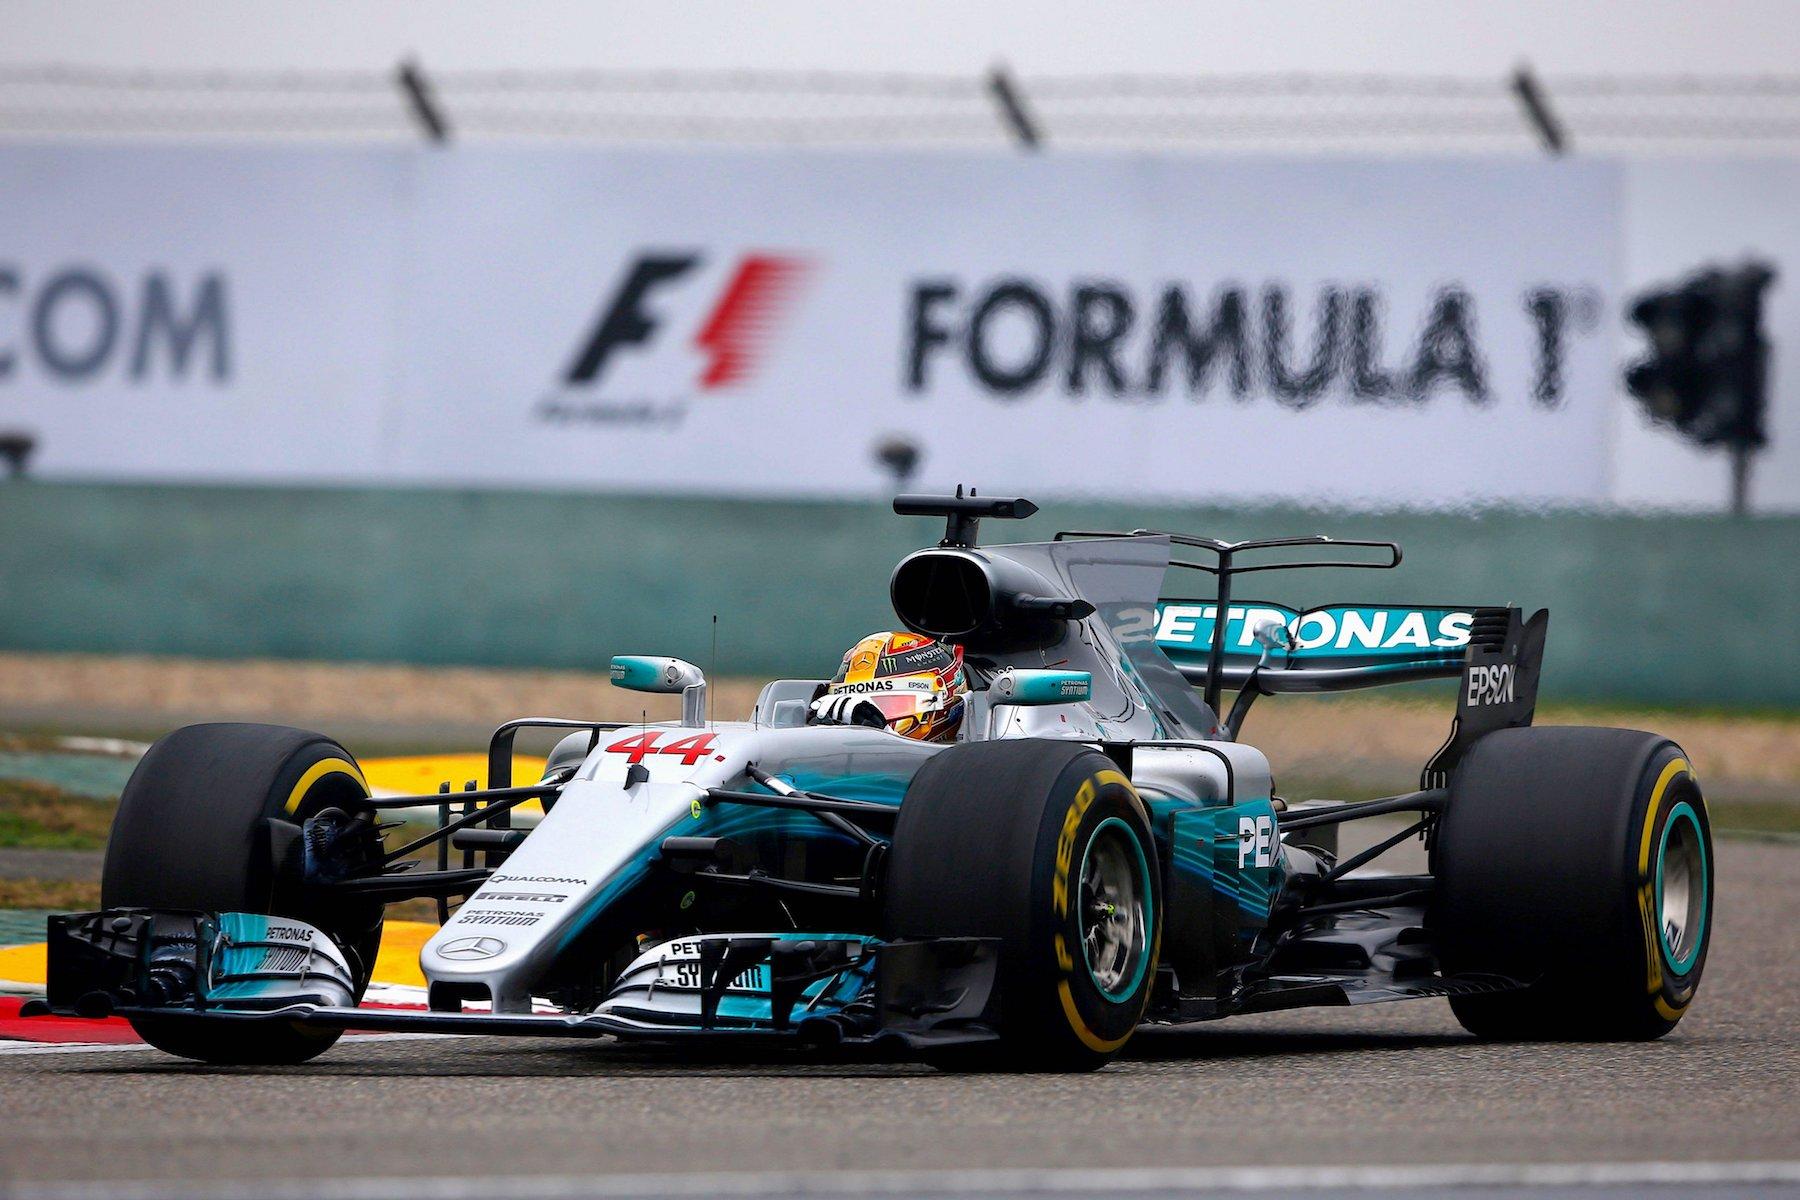 G 2017 Lewis Hamilton | Mercedes W08 | 2017 Chinese GP Winner 1 copy.jpg